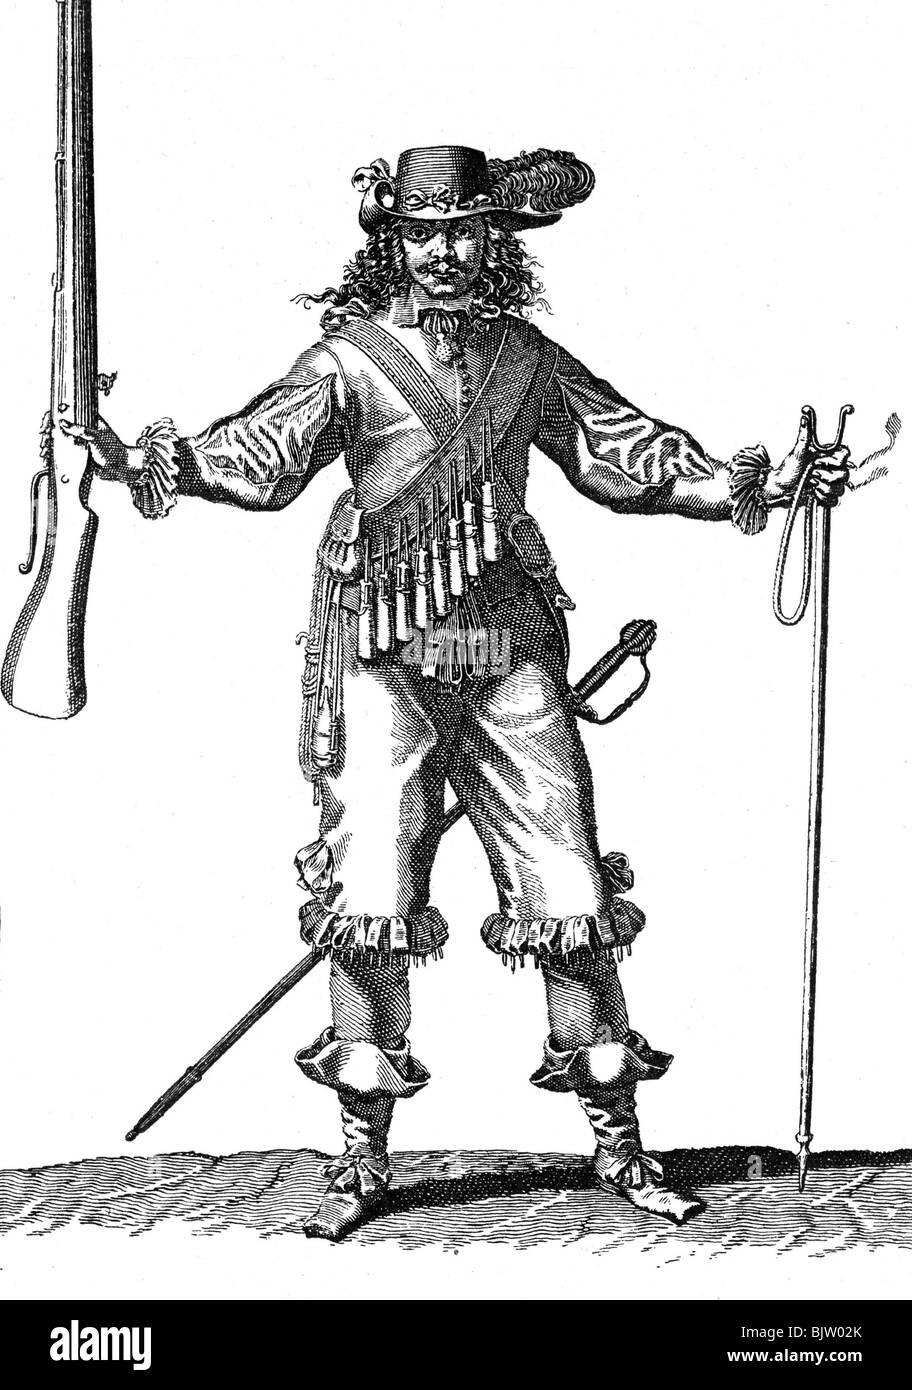 17 Jahrhundert Bild Architektur: Militär, 17. Jahrhundert, Infanterie, Musketier